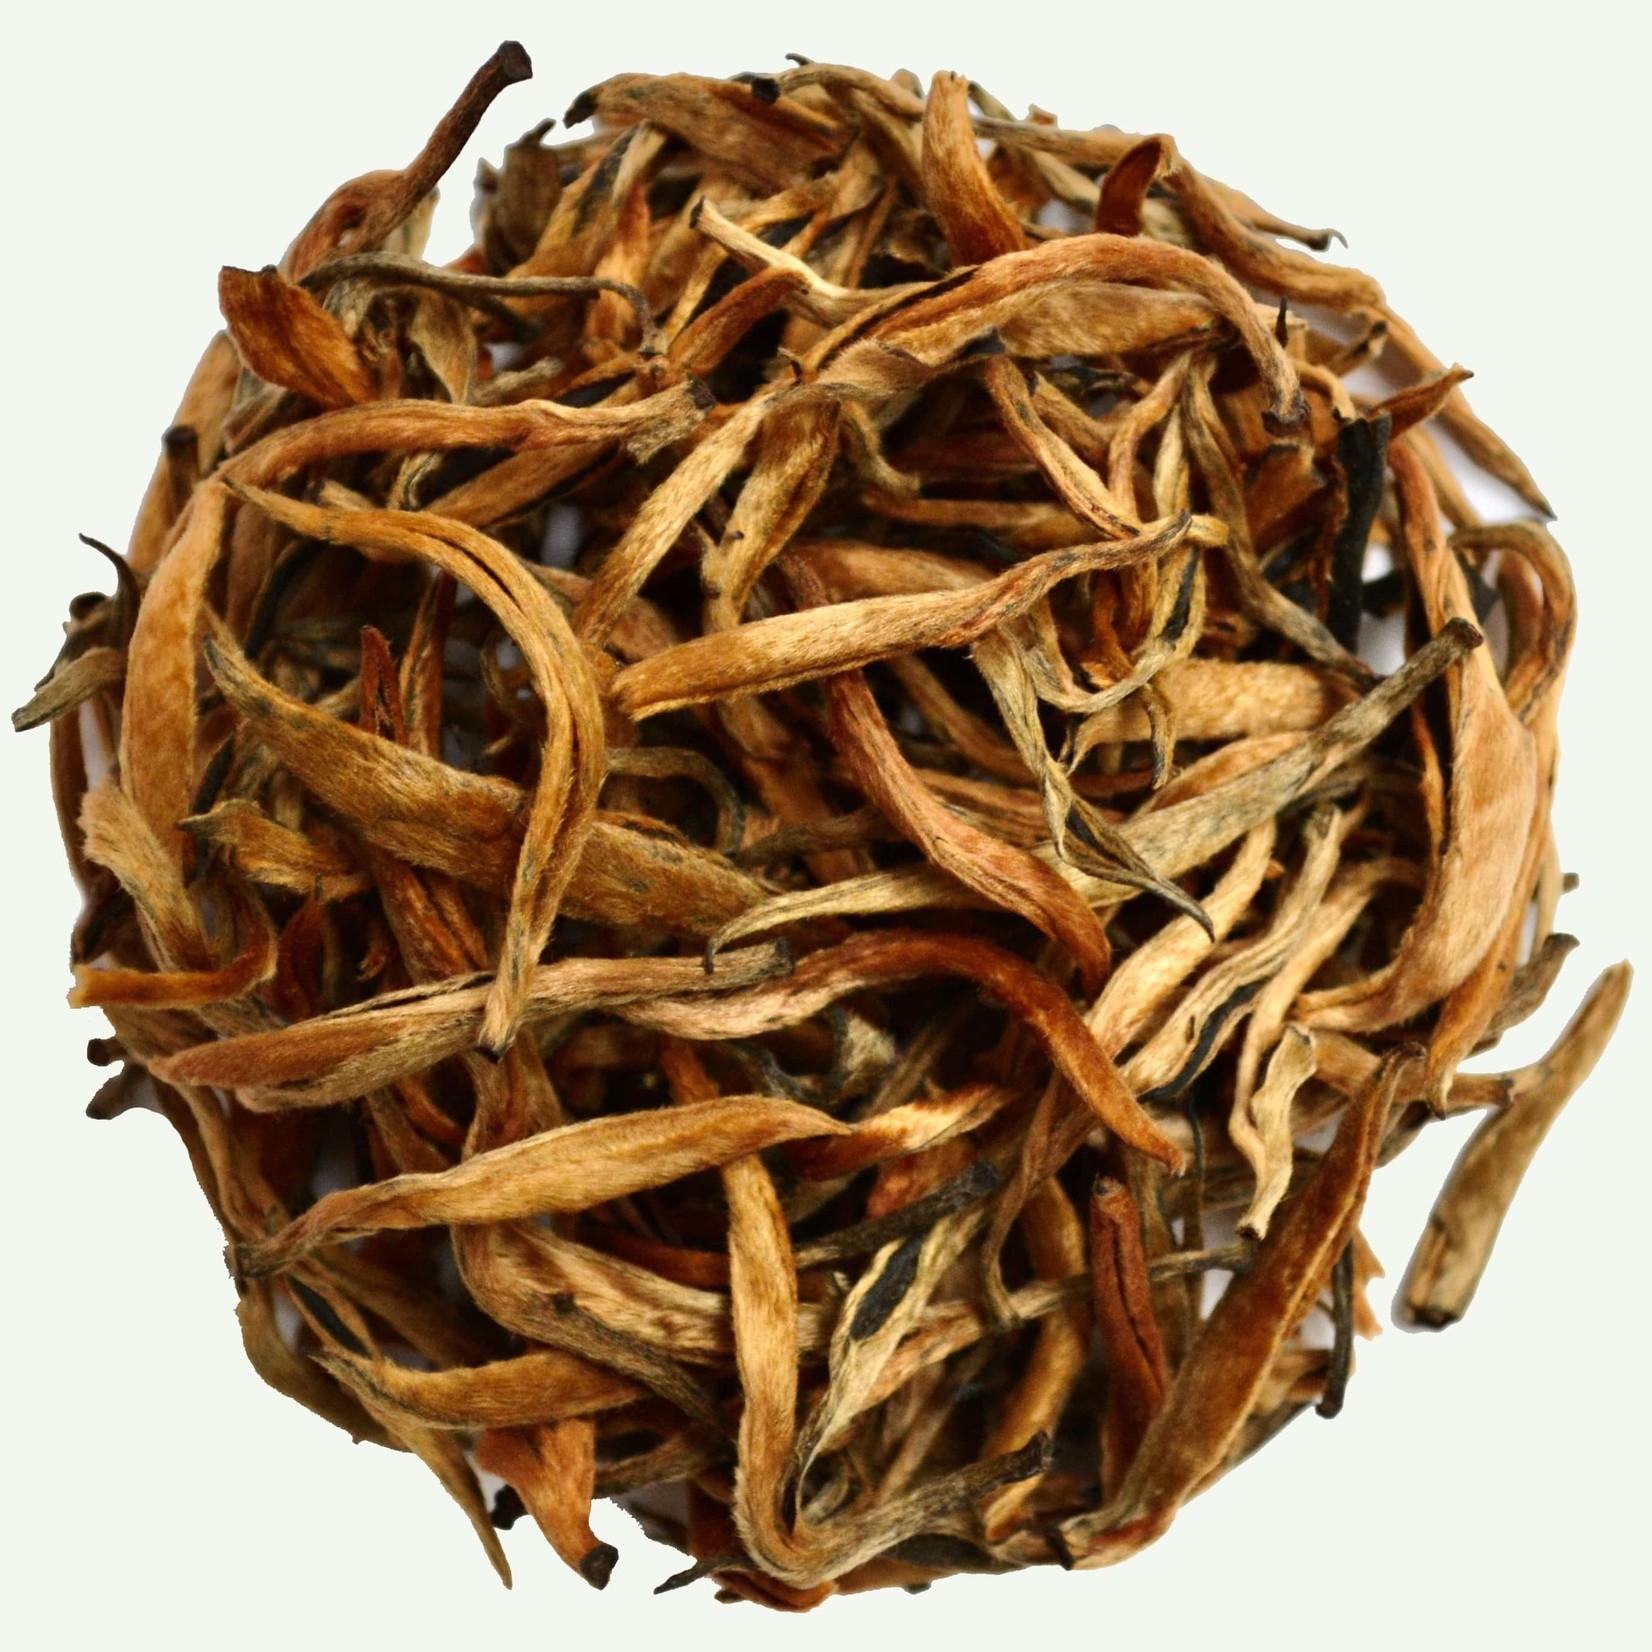 Yunnan 'Golden bud'